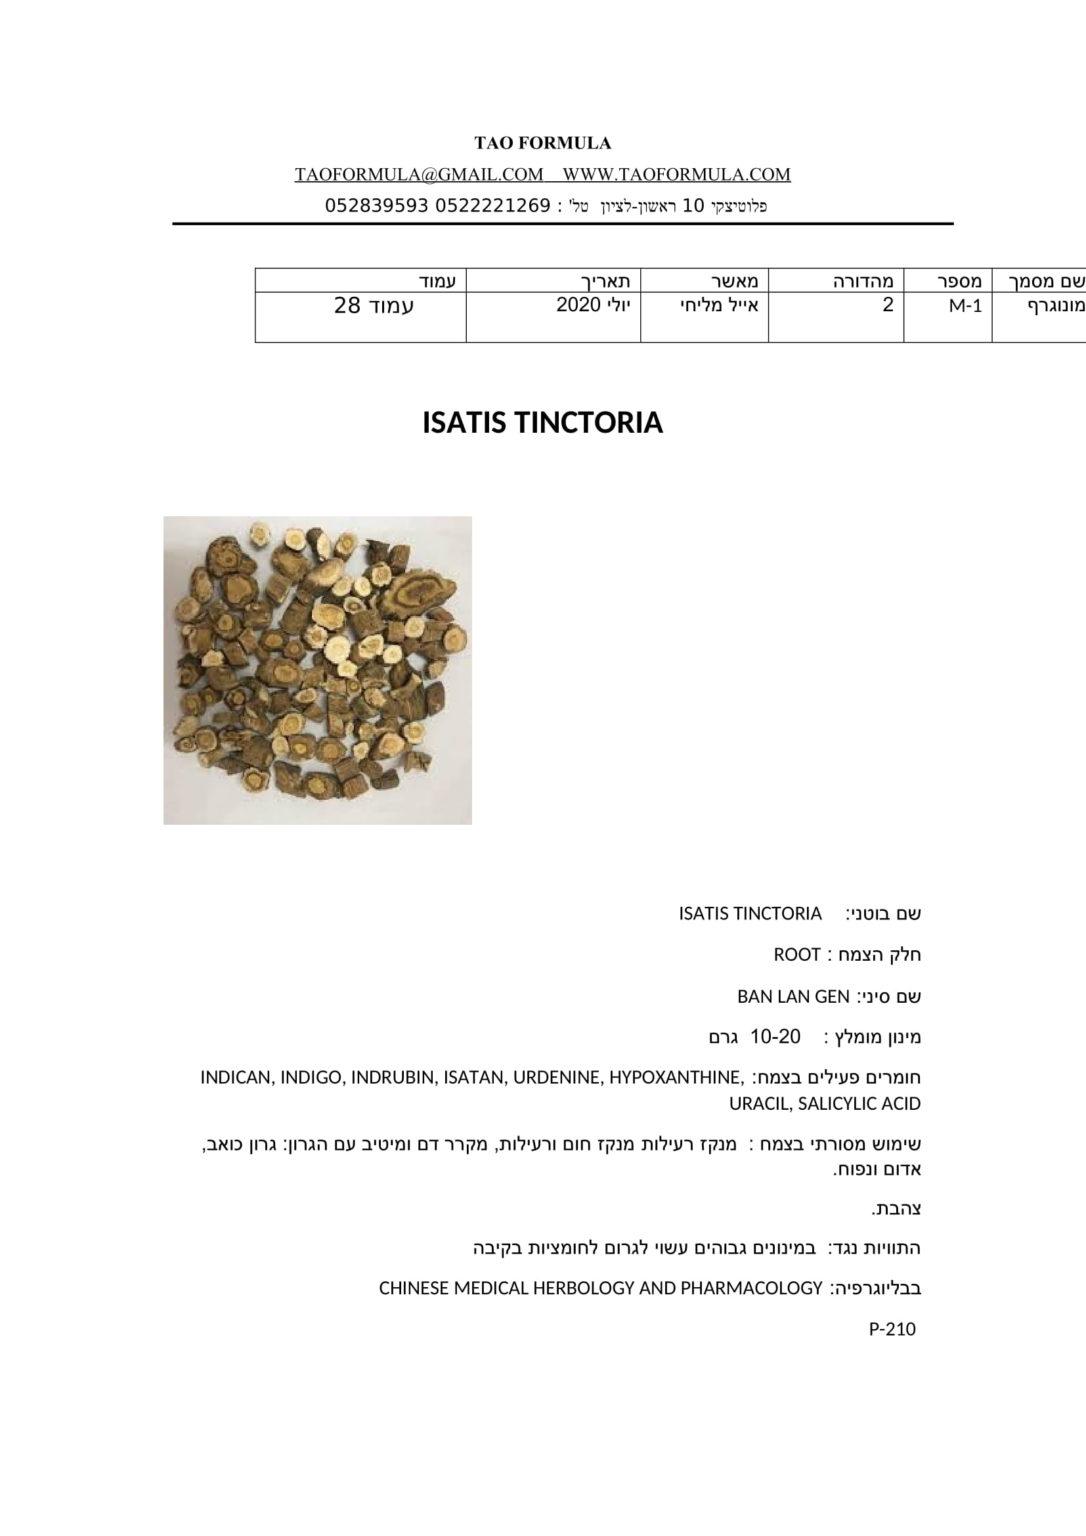 ISATIS TINCTORIA 1